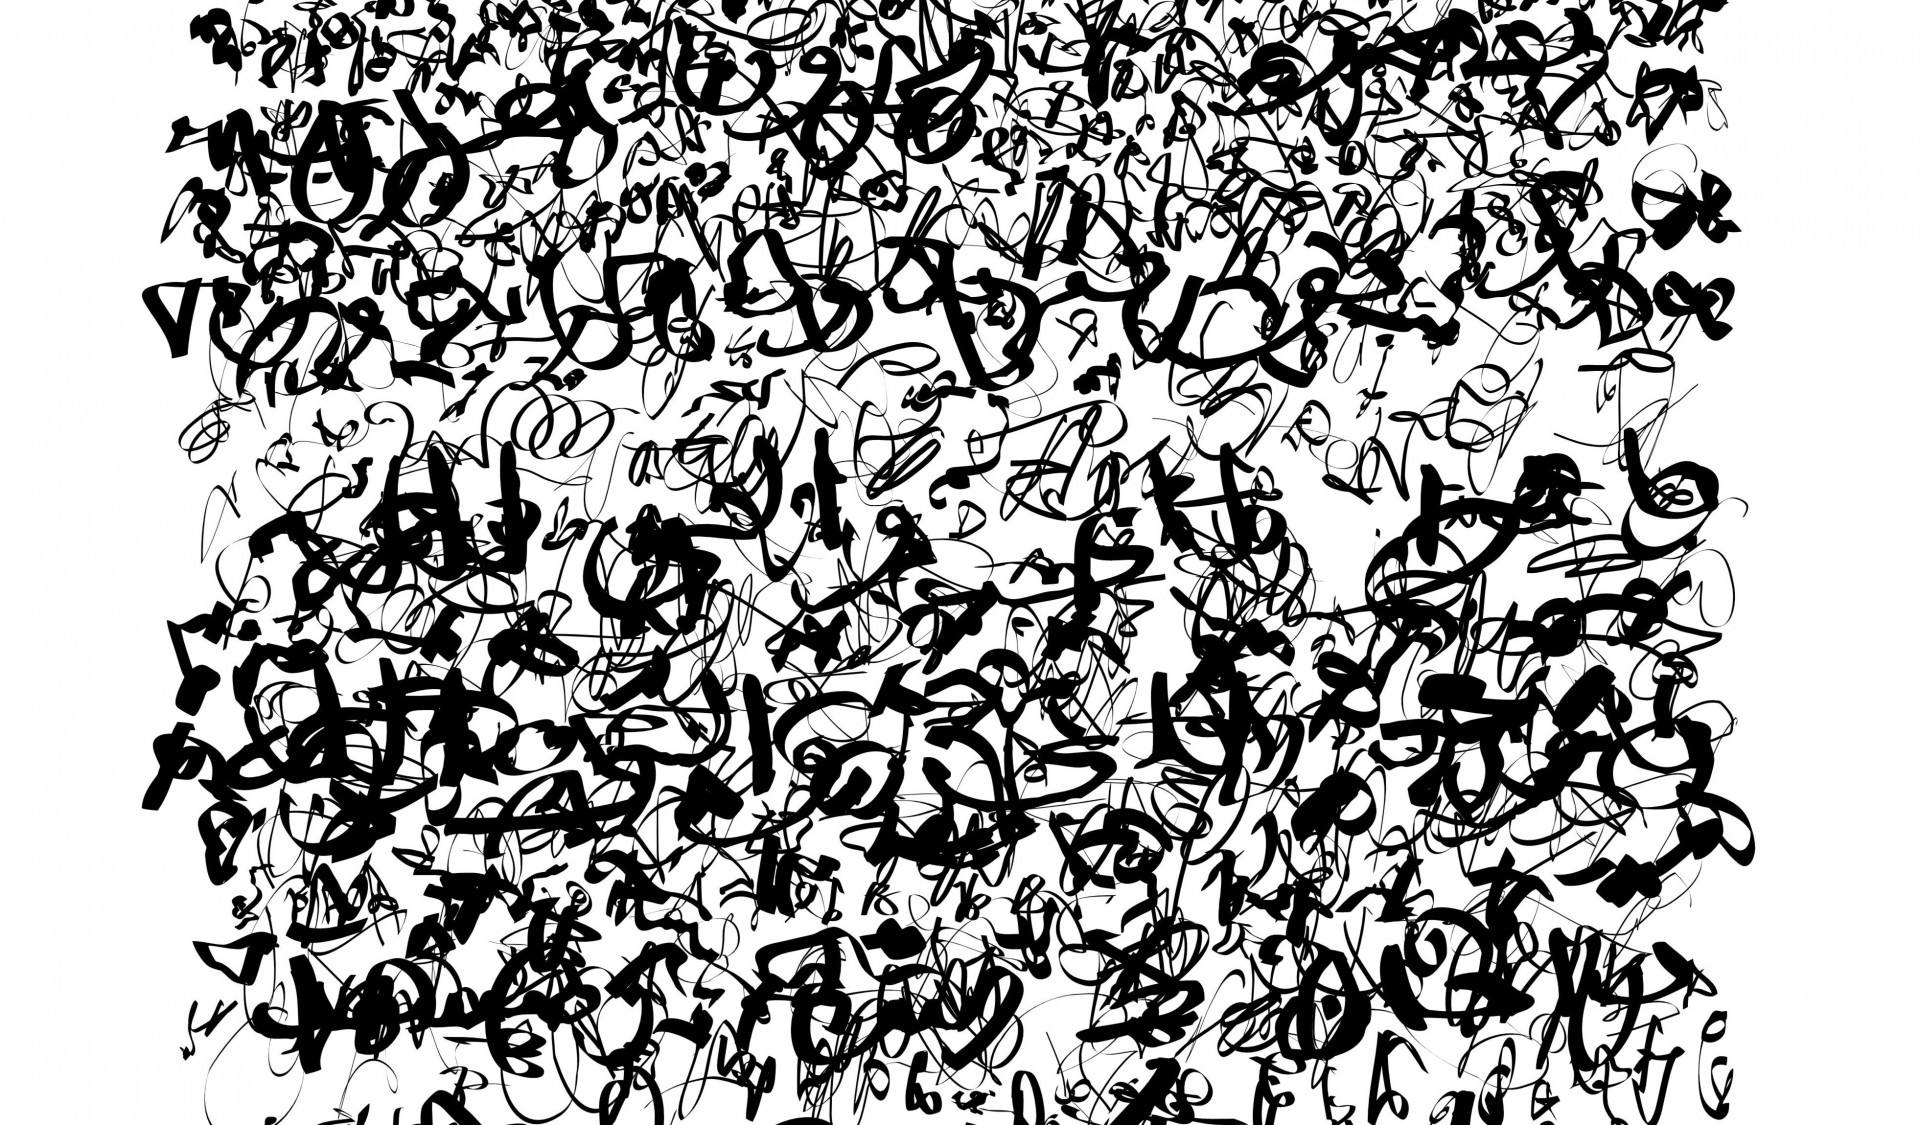 Ausschnitt: Palimpsest 017, Eco-Solvent Tinte auf LKW-Plane, 137 x 205 cm, 2017